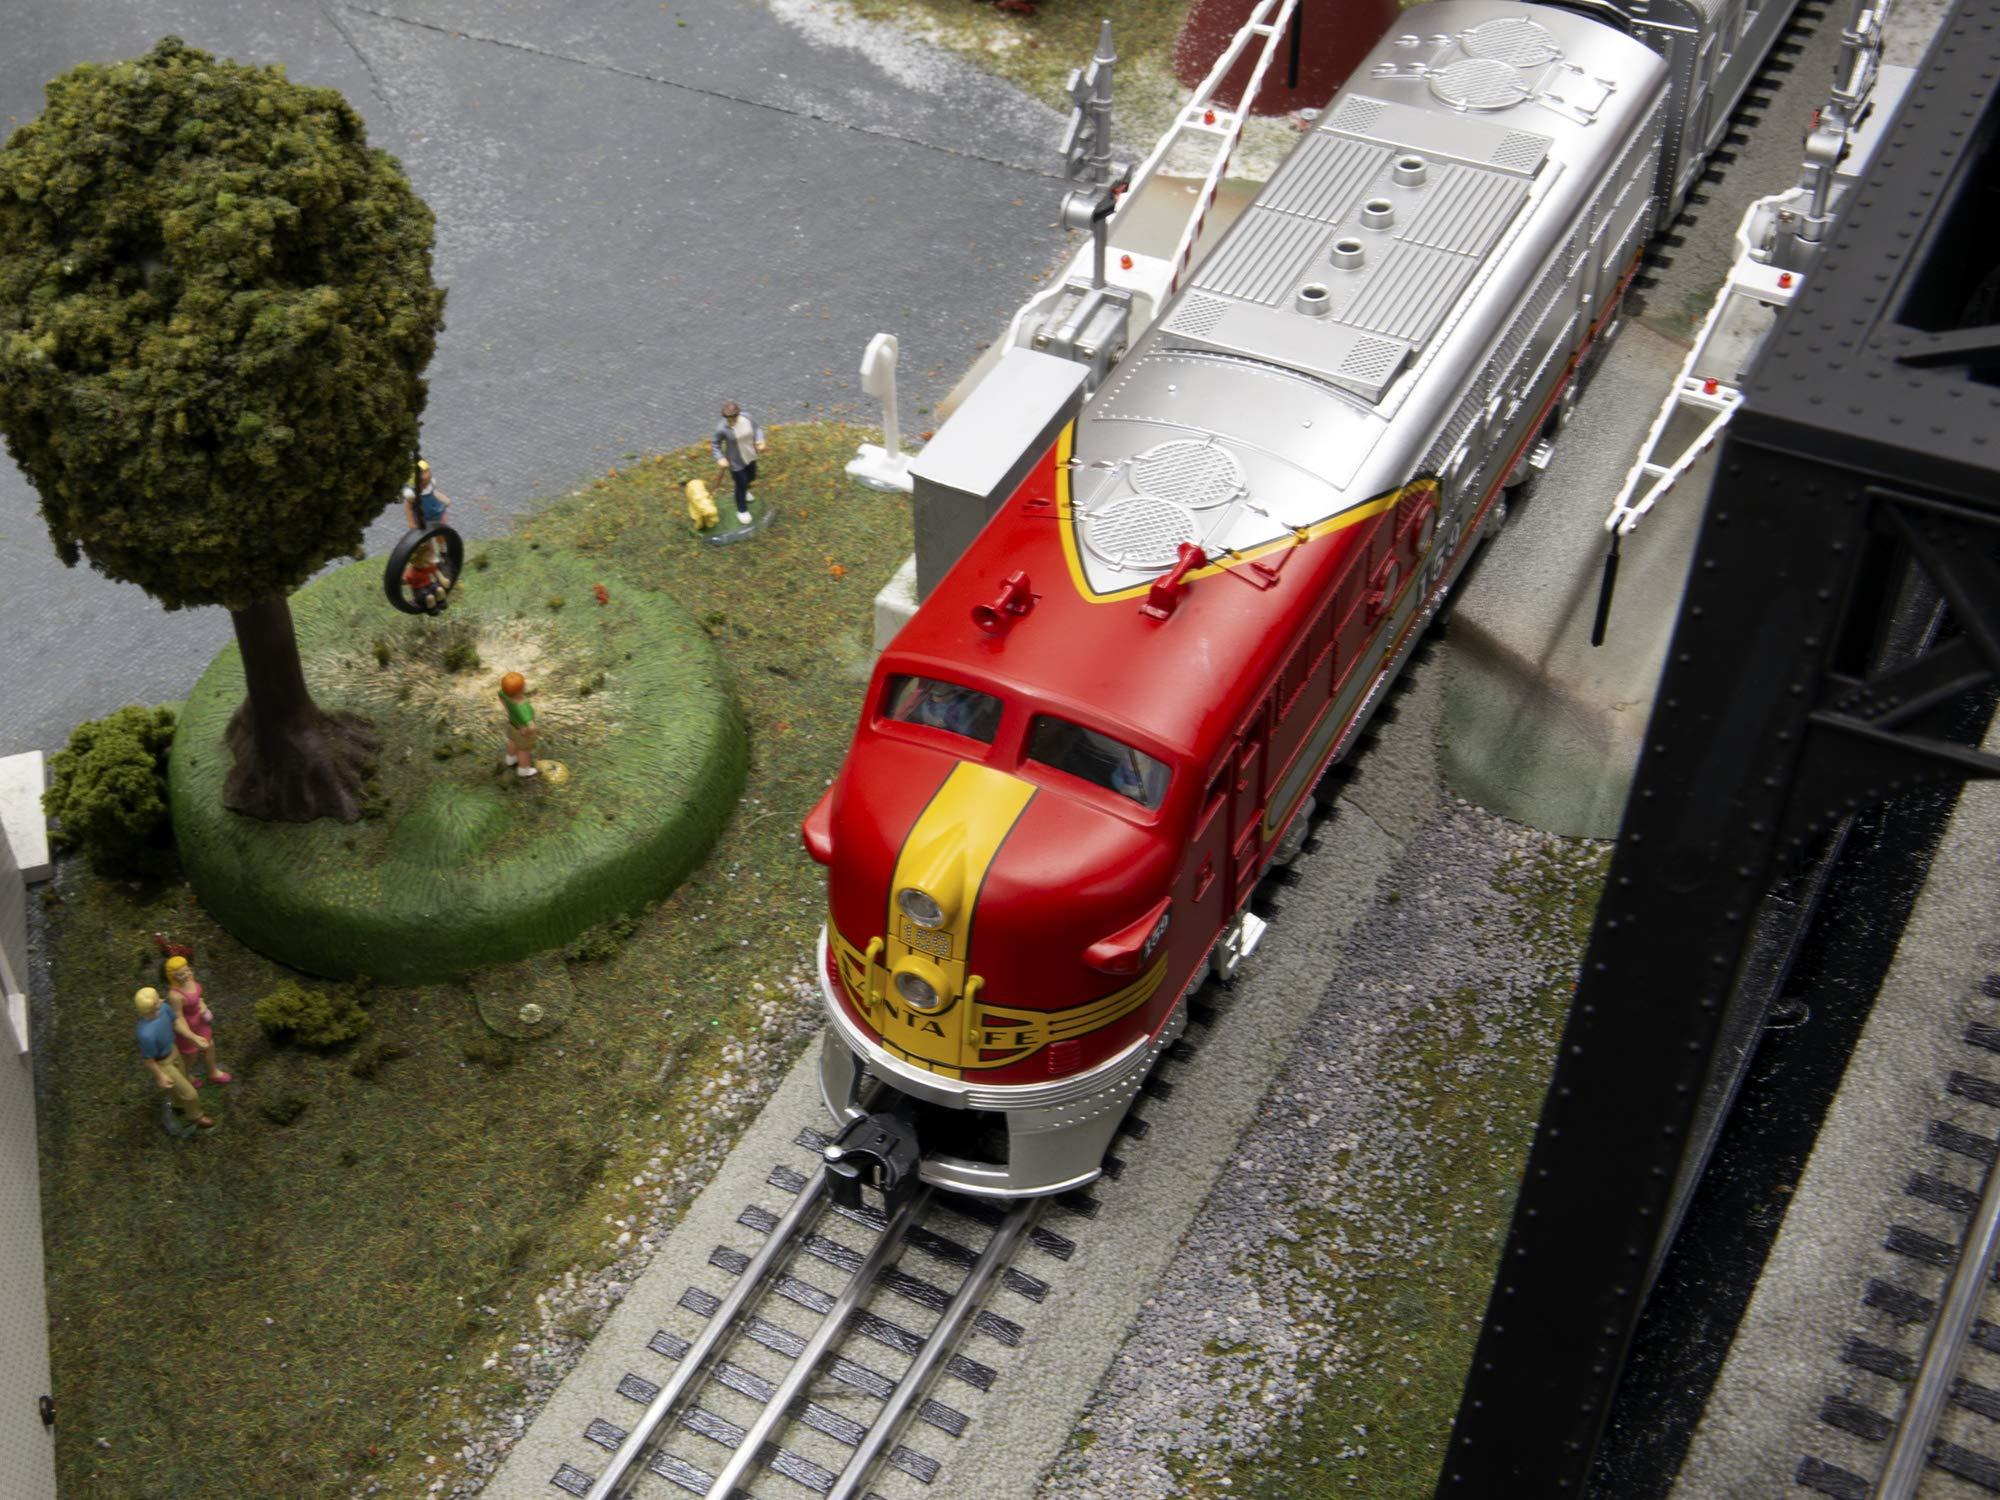 Lionel Santa Fe Super Chief Electric O Gauge Model Train Set w/ Remote and Bluetooth Capability by Lionel (Image #3)